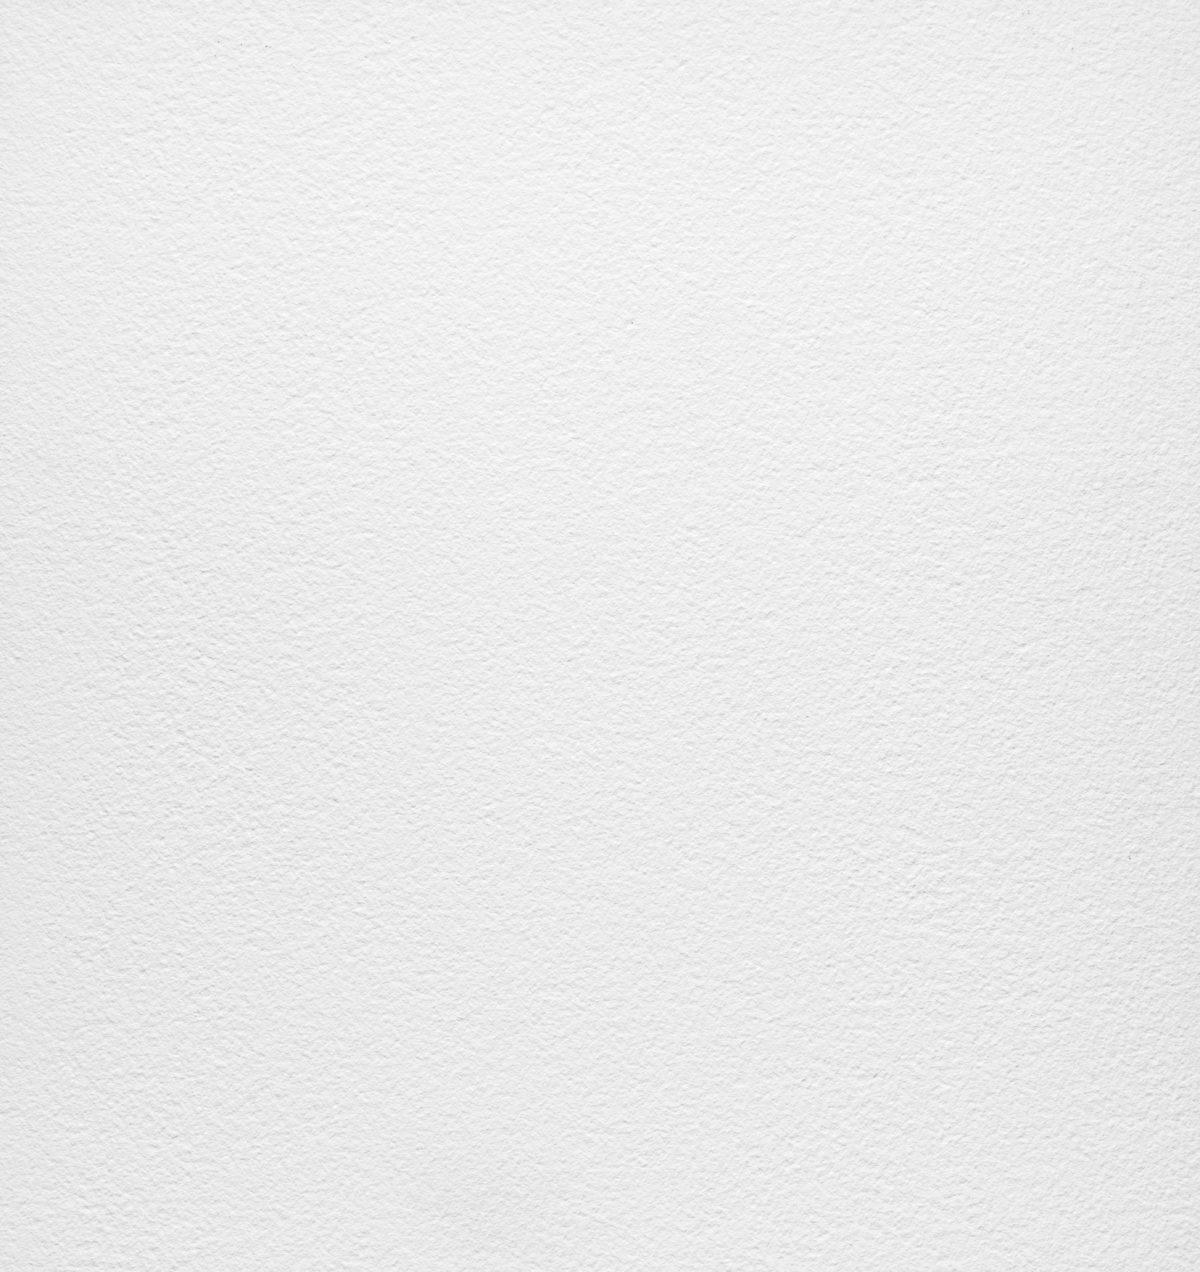 Lapitech Worktop Absolute White - Arena Finish